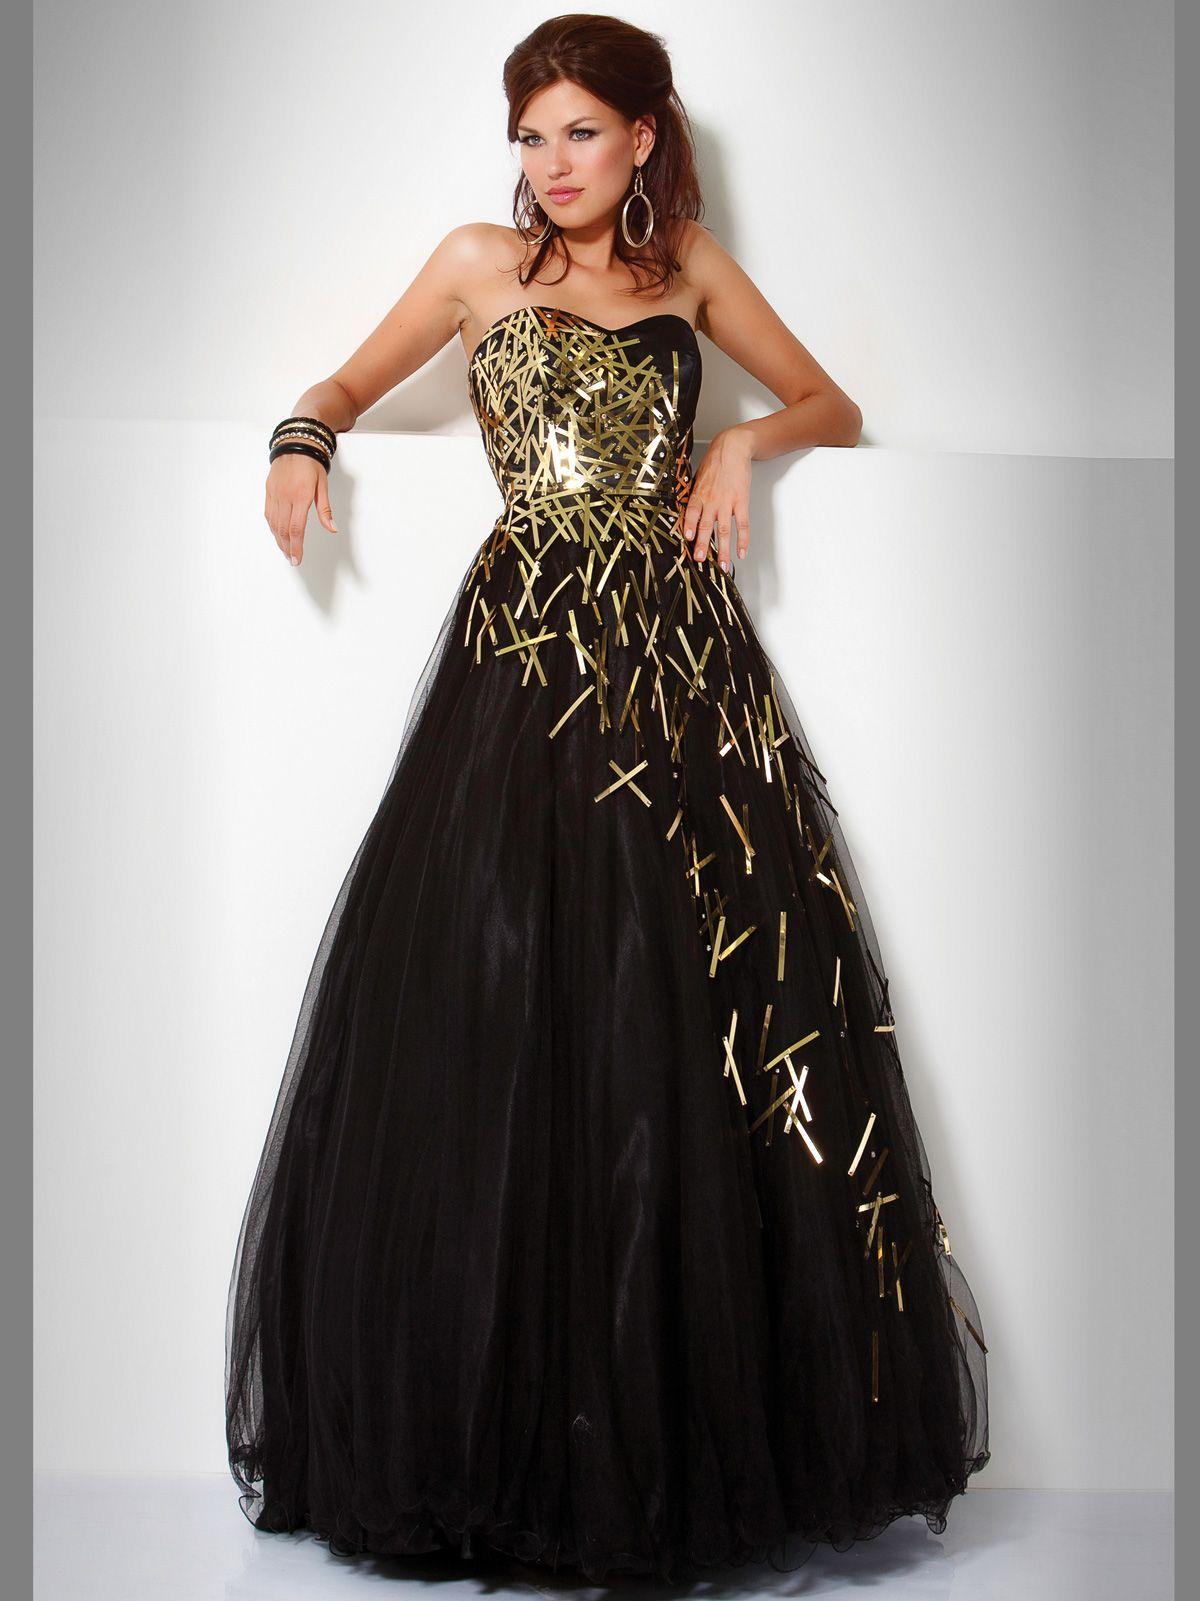 Cascading metal dress amazing ooh la la clothes pinterest